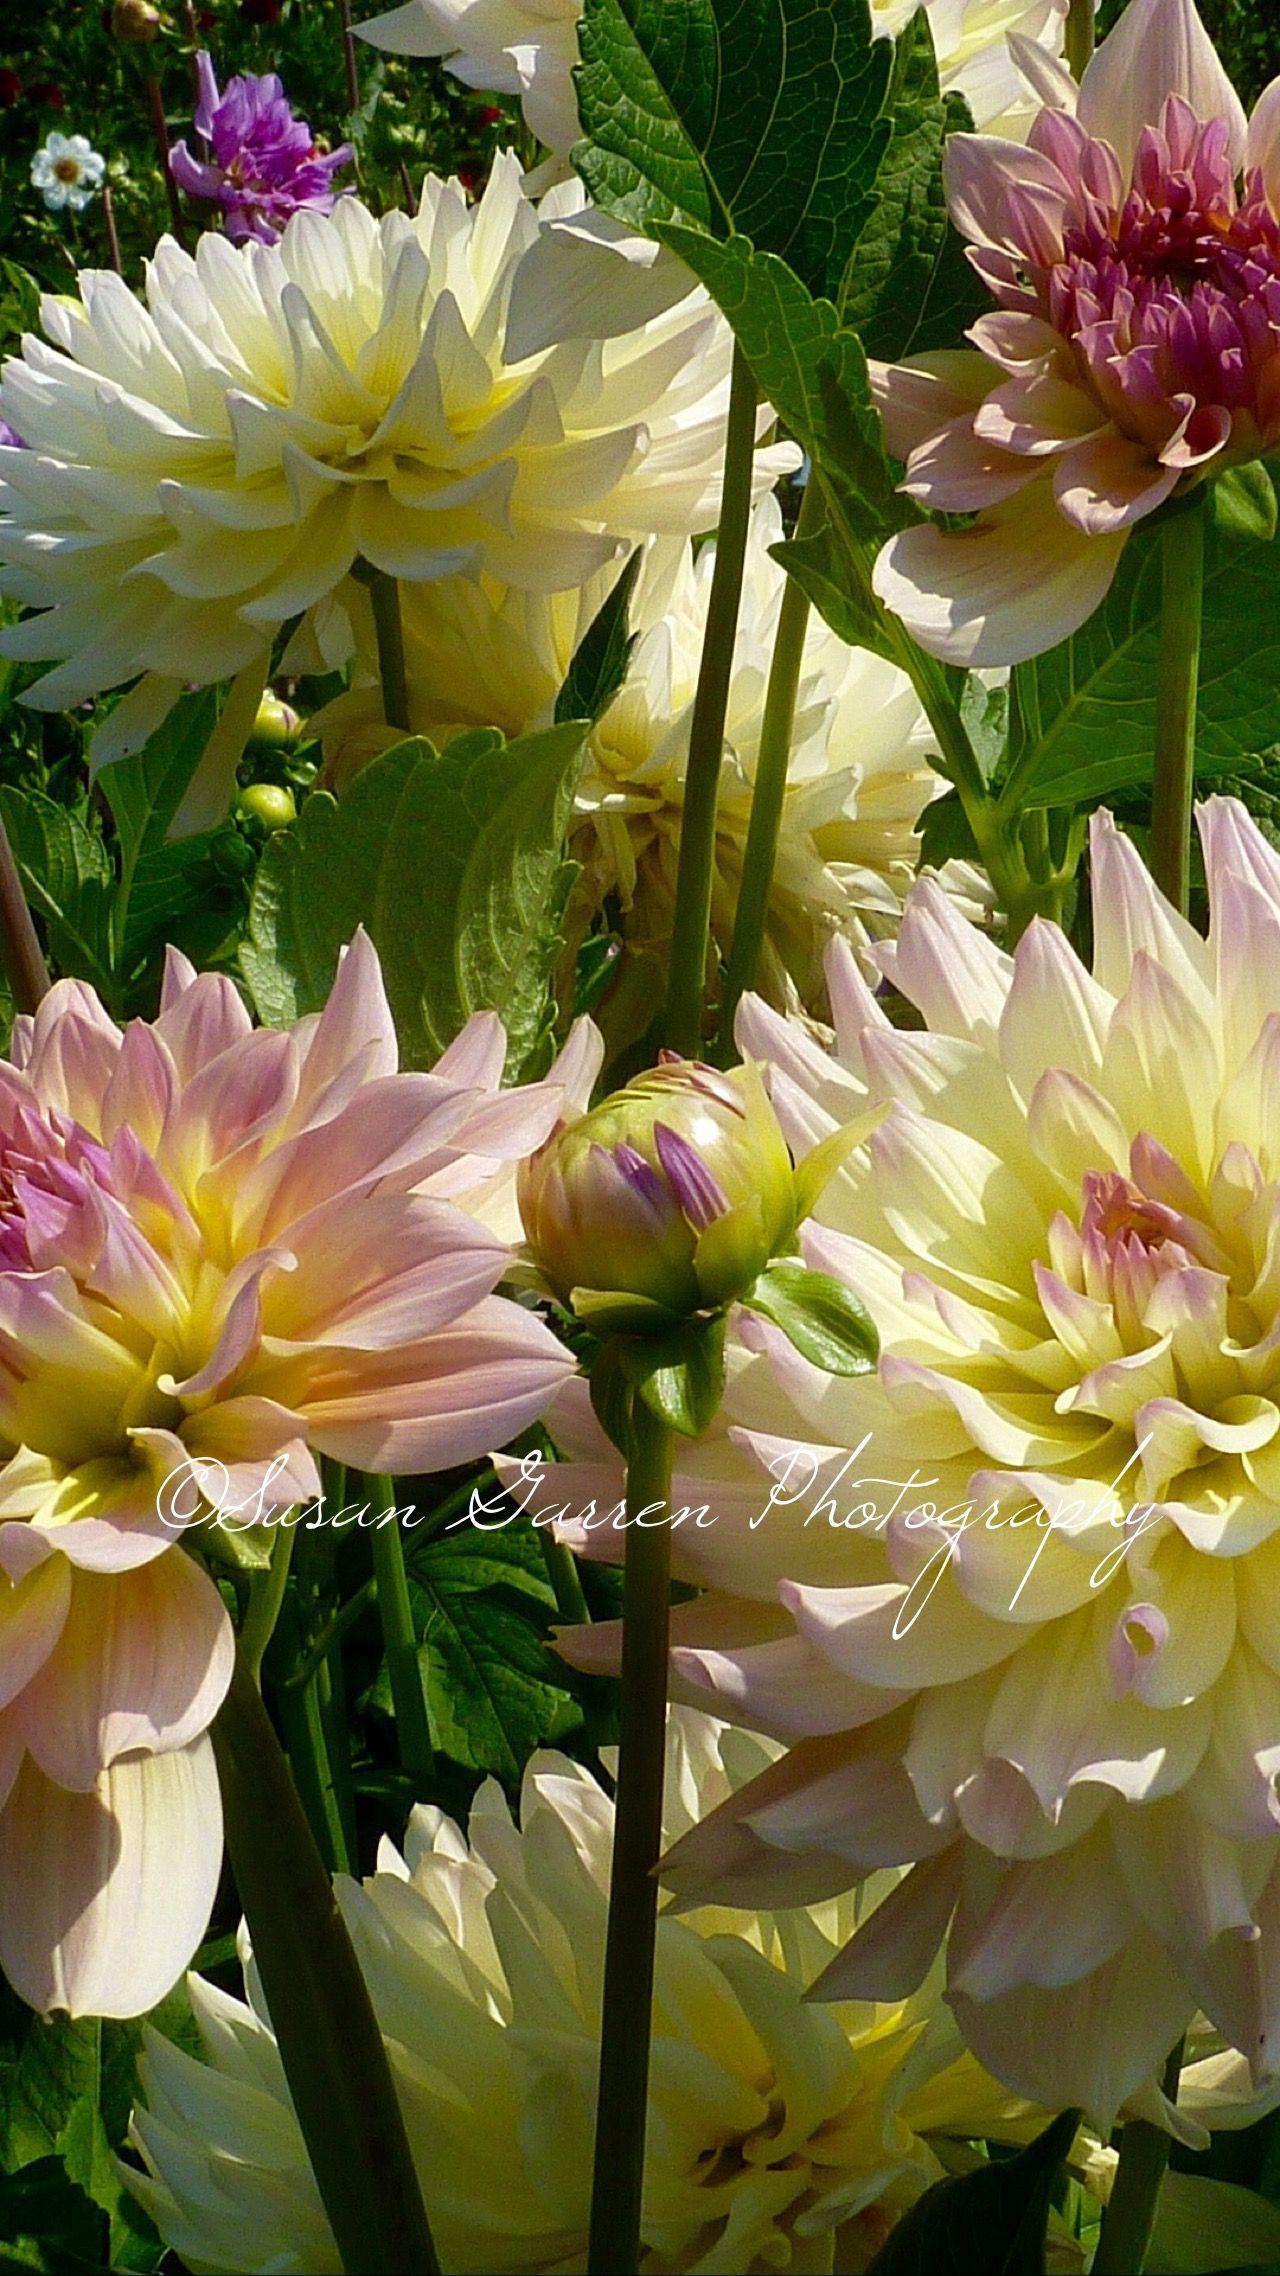 Susan Garren Pixels Dahlia Flowers